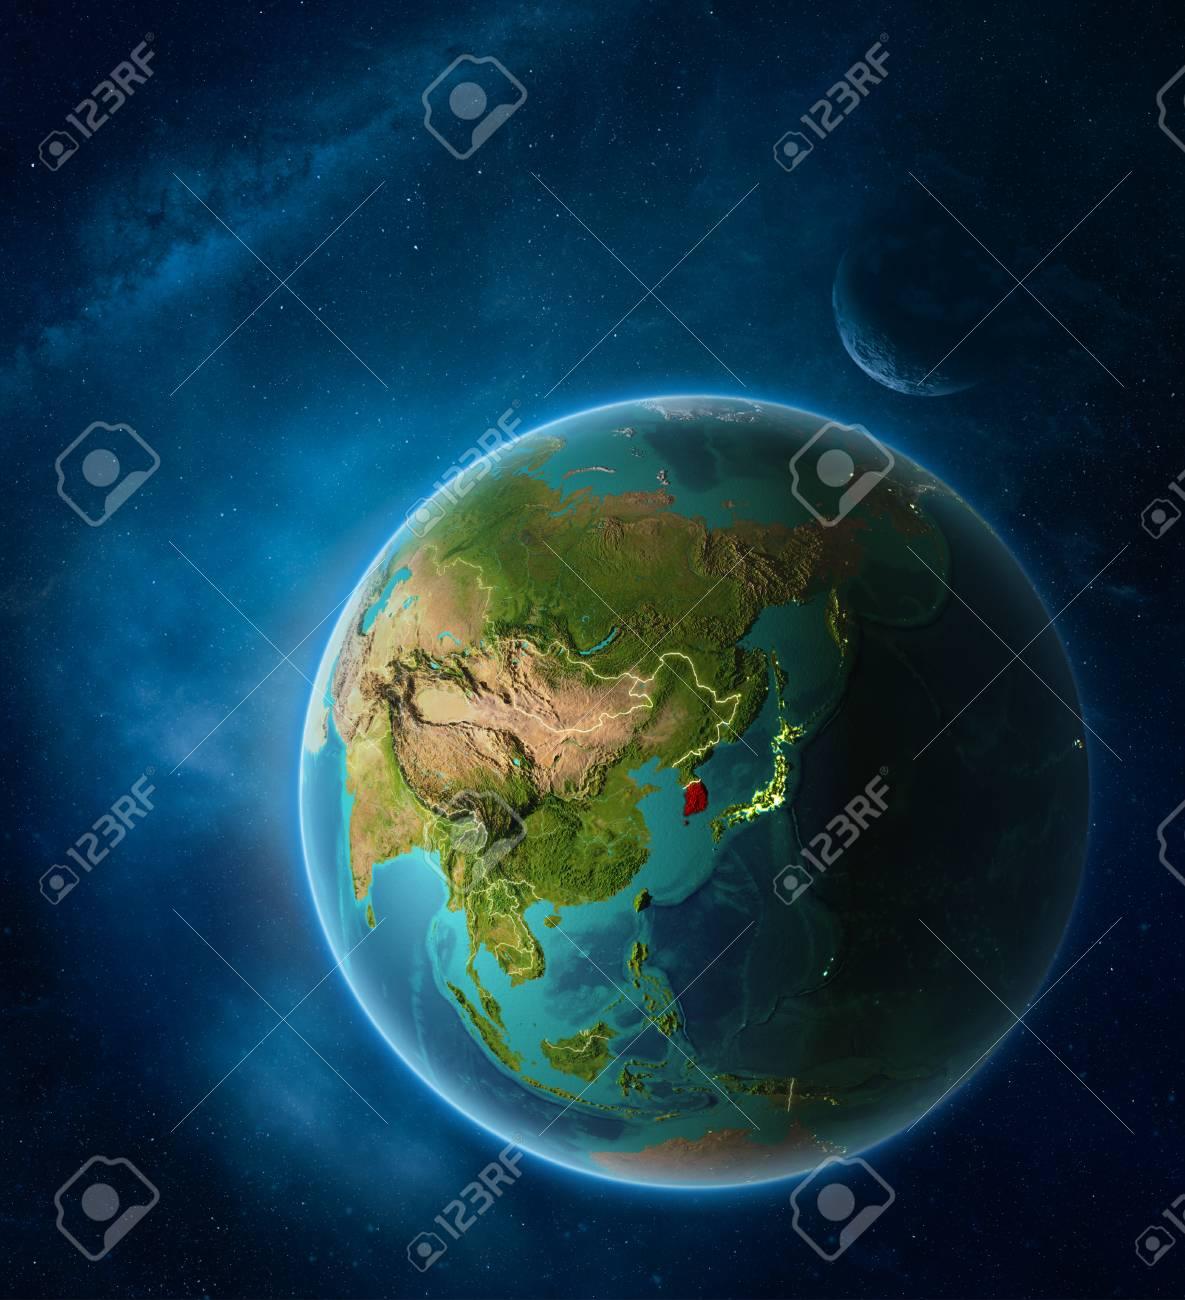 Stock Illustration on korea satellite night time, korea world of lights, germany light map, usa light map, global light map, africa light map, afghanistan light map, indonesia light map, pakistan light map, korea at night, malawi light map,